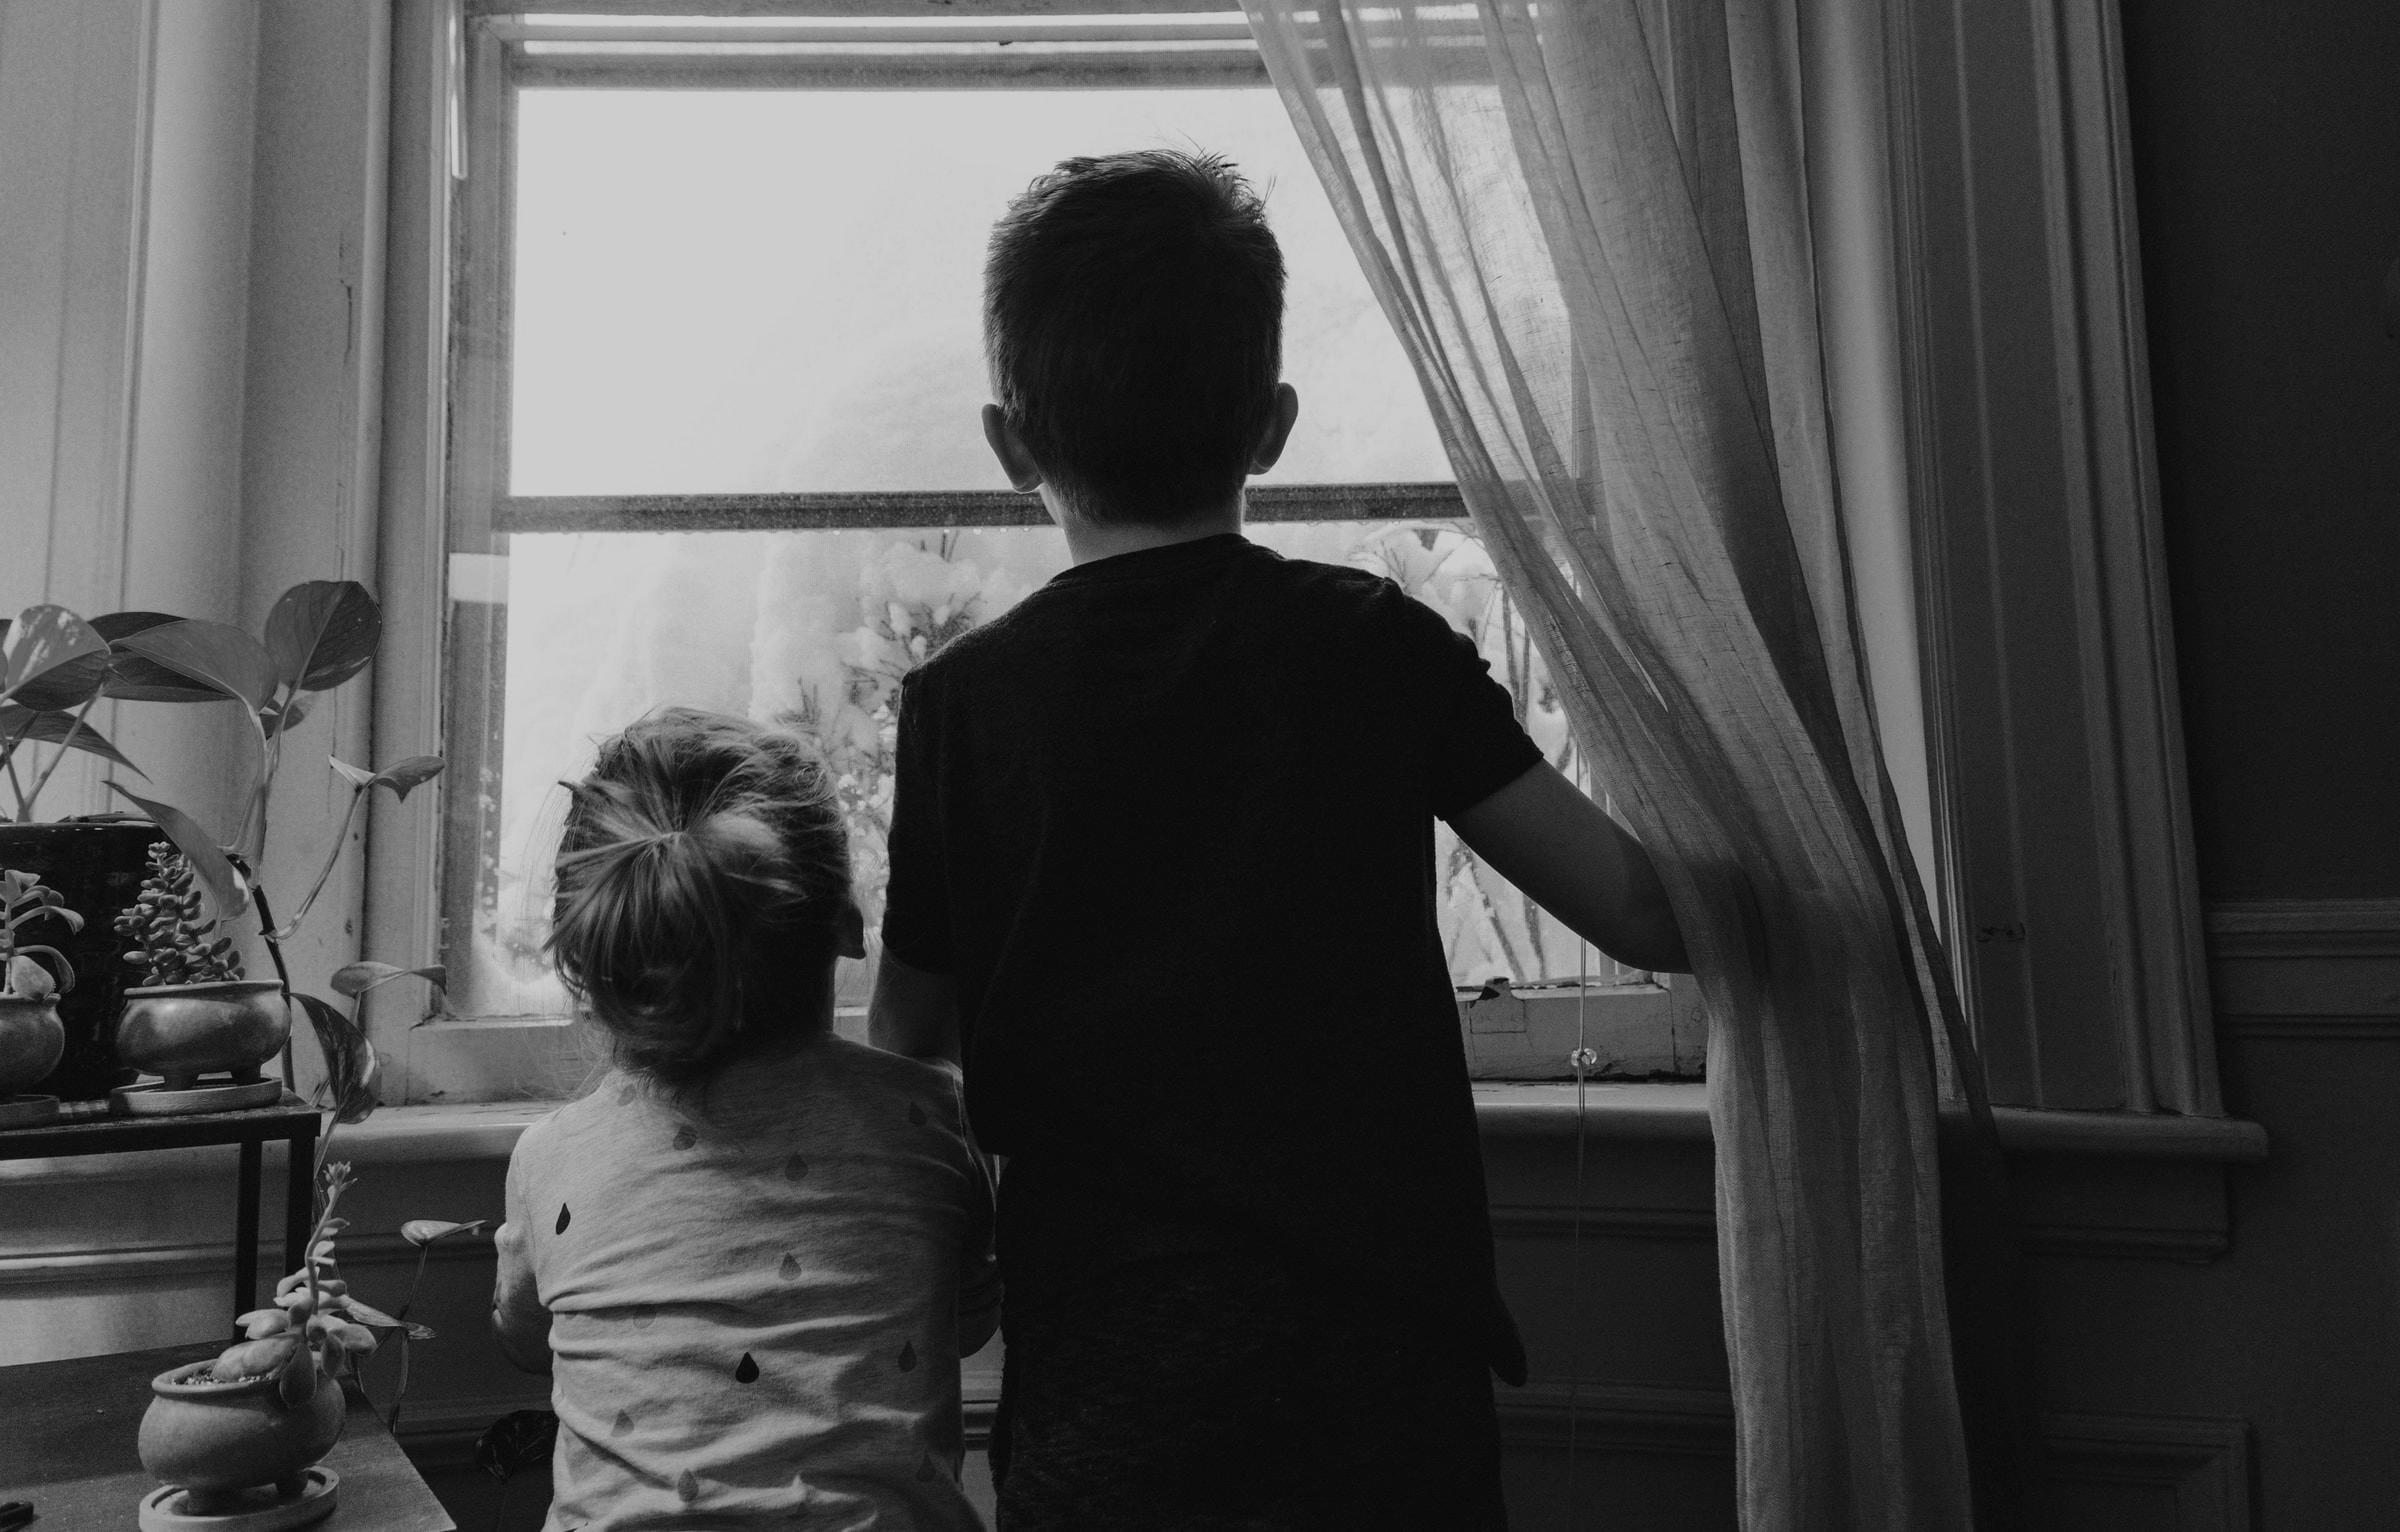 Coronavirus Behaviour Change Stay Indoors (B&W) - Brighton Hove Energy Services Cop Blog - Kelly Sikkema - UnSplash